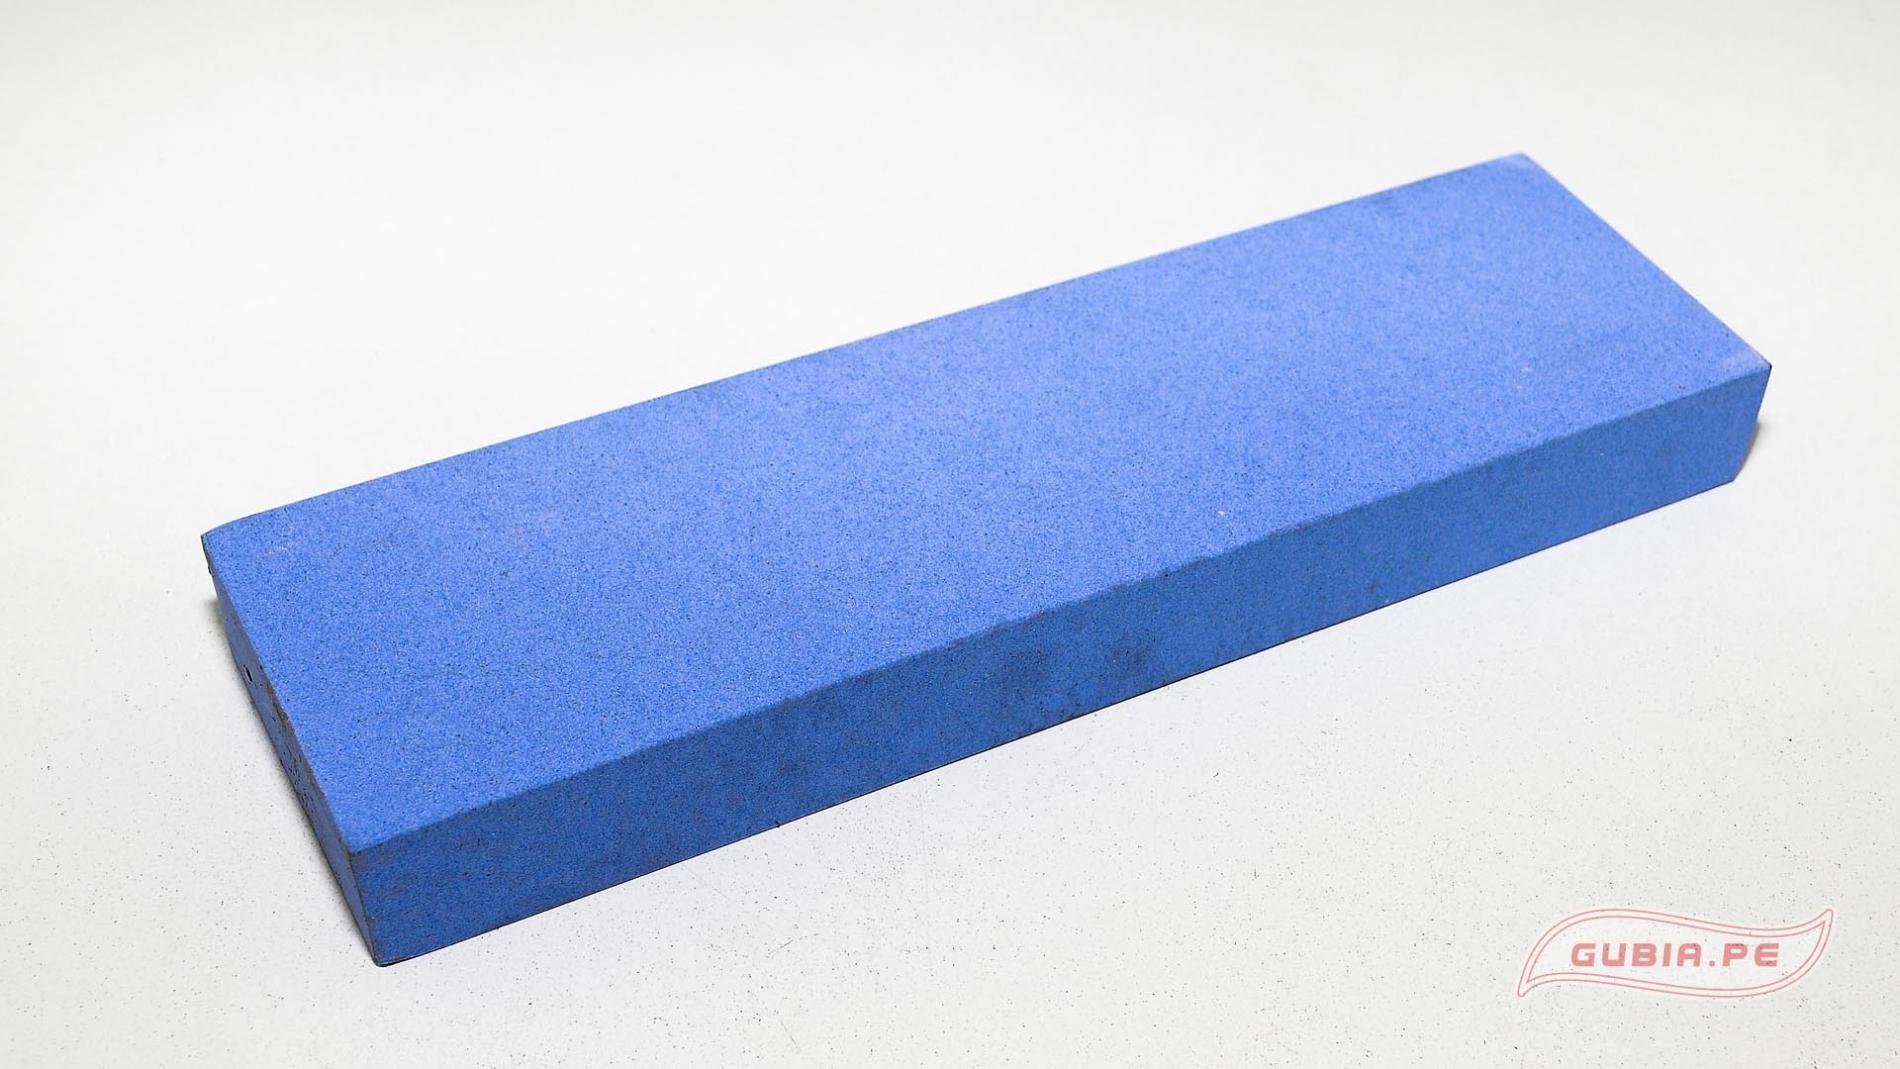 Zische1200-Piedra de afilar 1200 preparar rutina de afilado 250x75x25mm ARKando Zische-max-1.